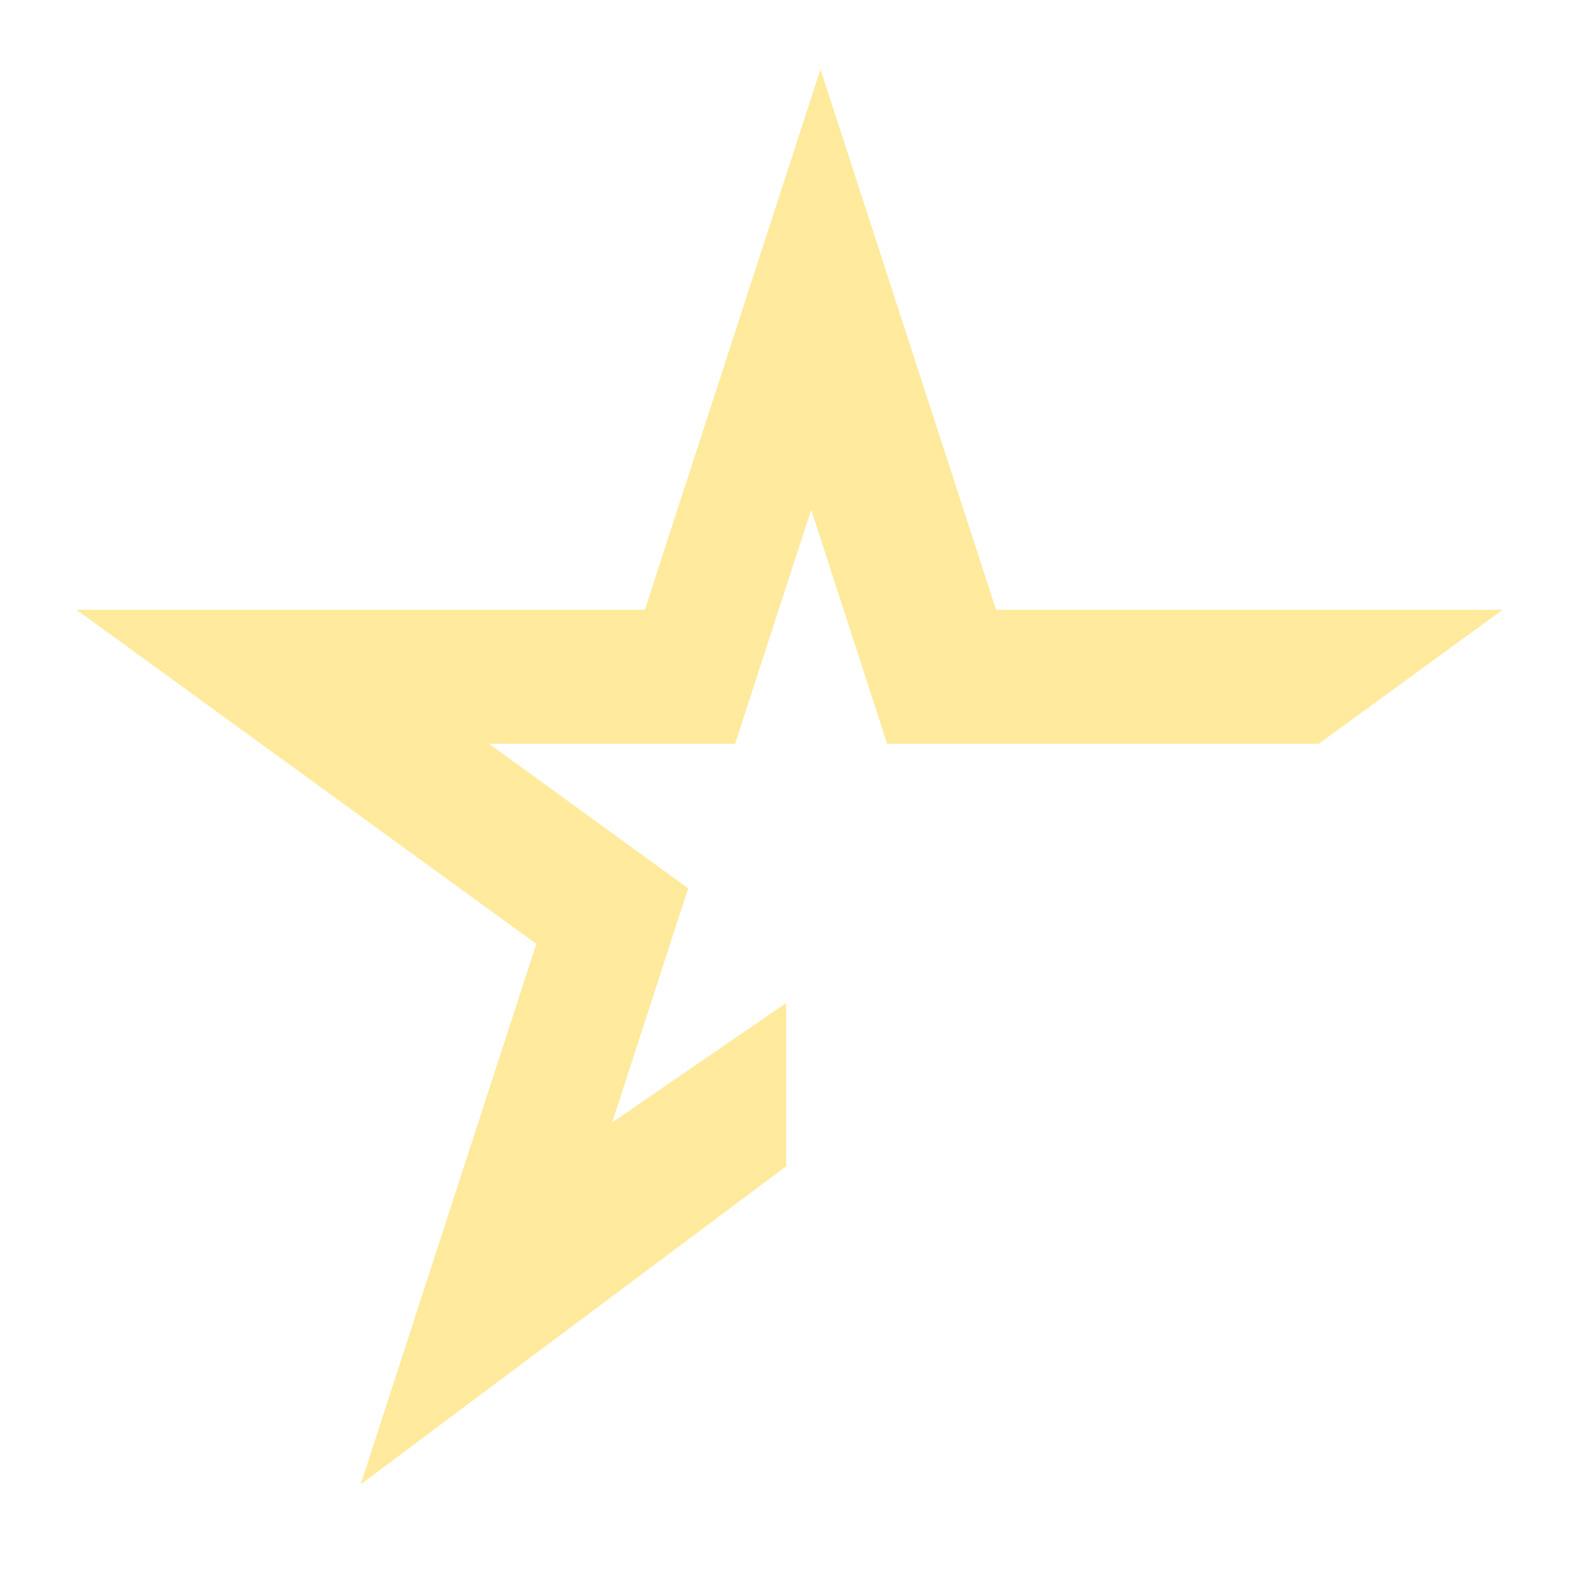 Star Graphic - Cliparts.co